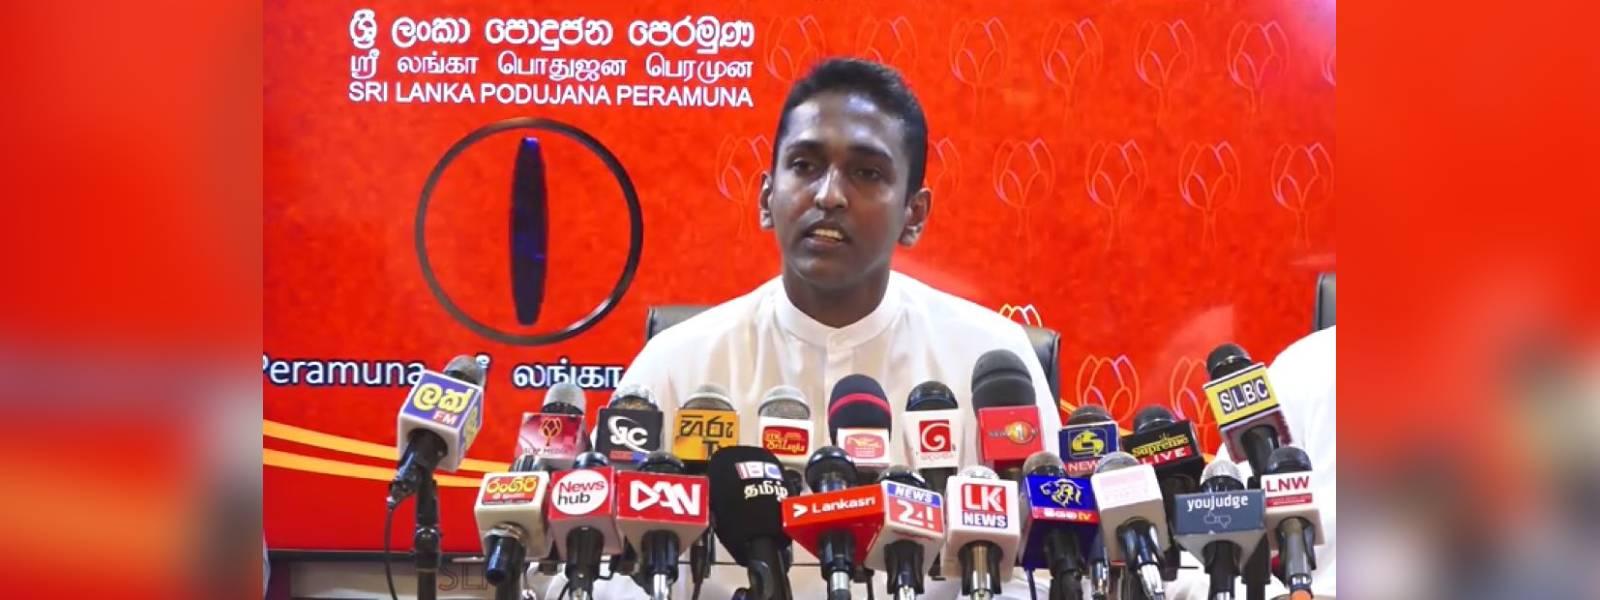 Govt. MP's deny deforestation near Sinharaja